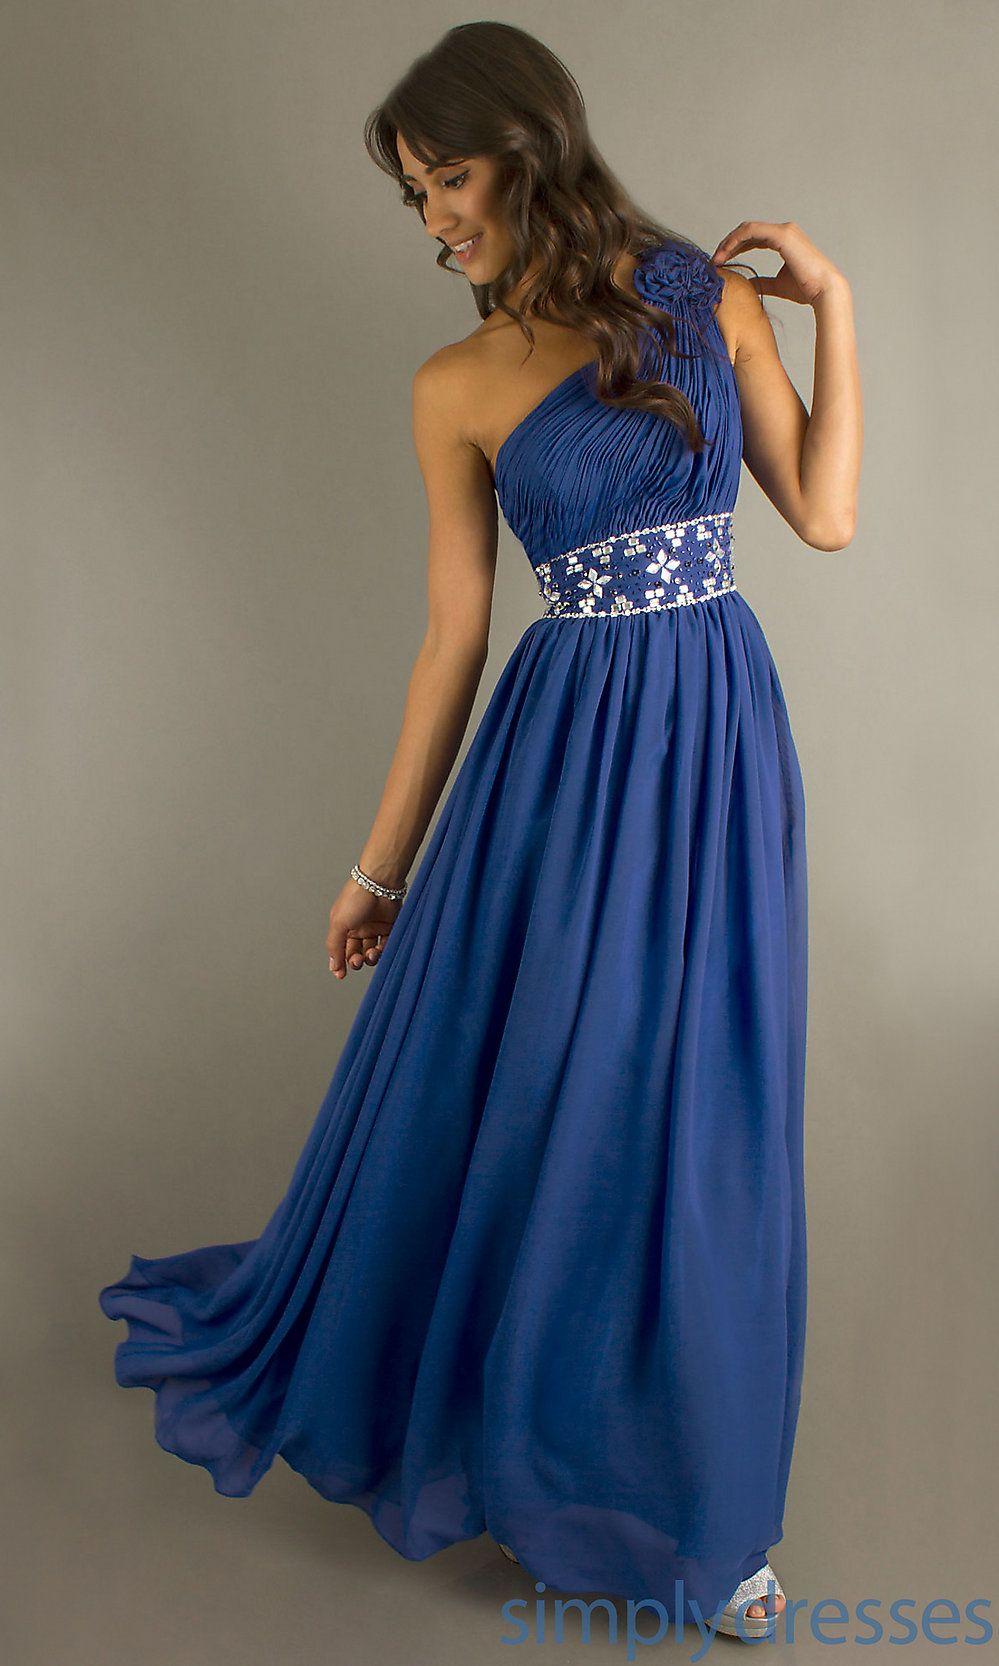 Blue dress blue dressesastonishing blue dresses tzlpfc wedding